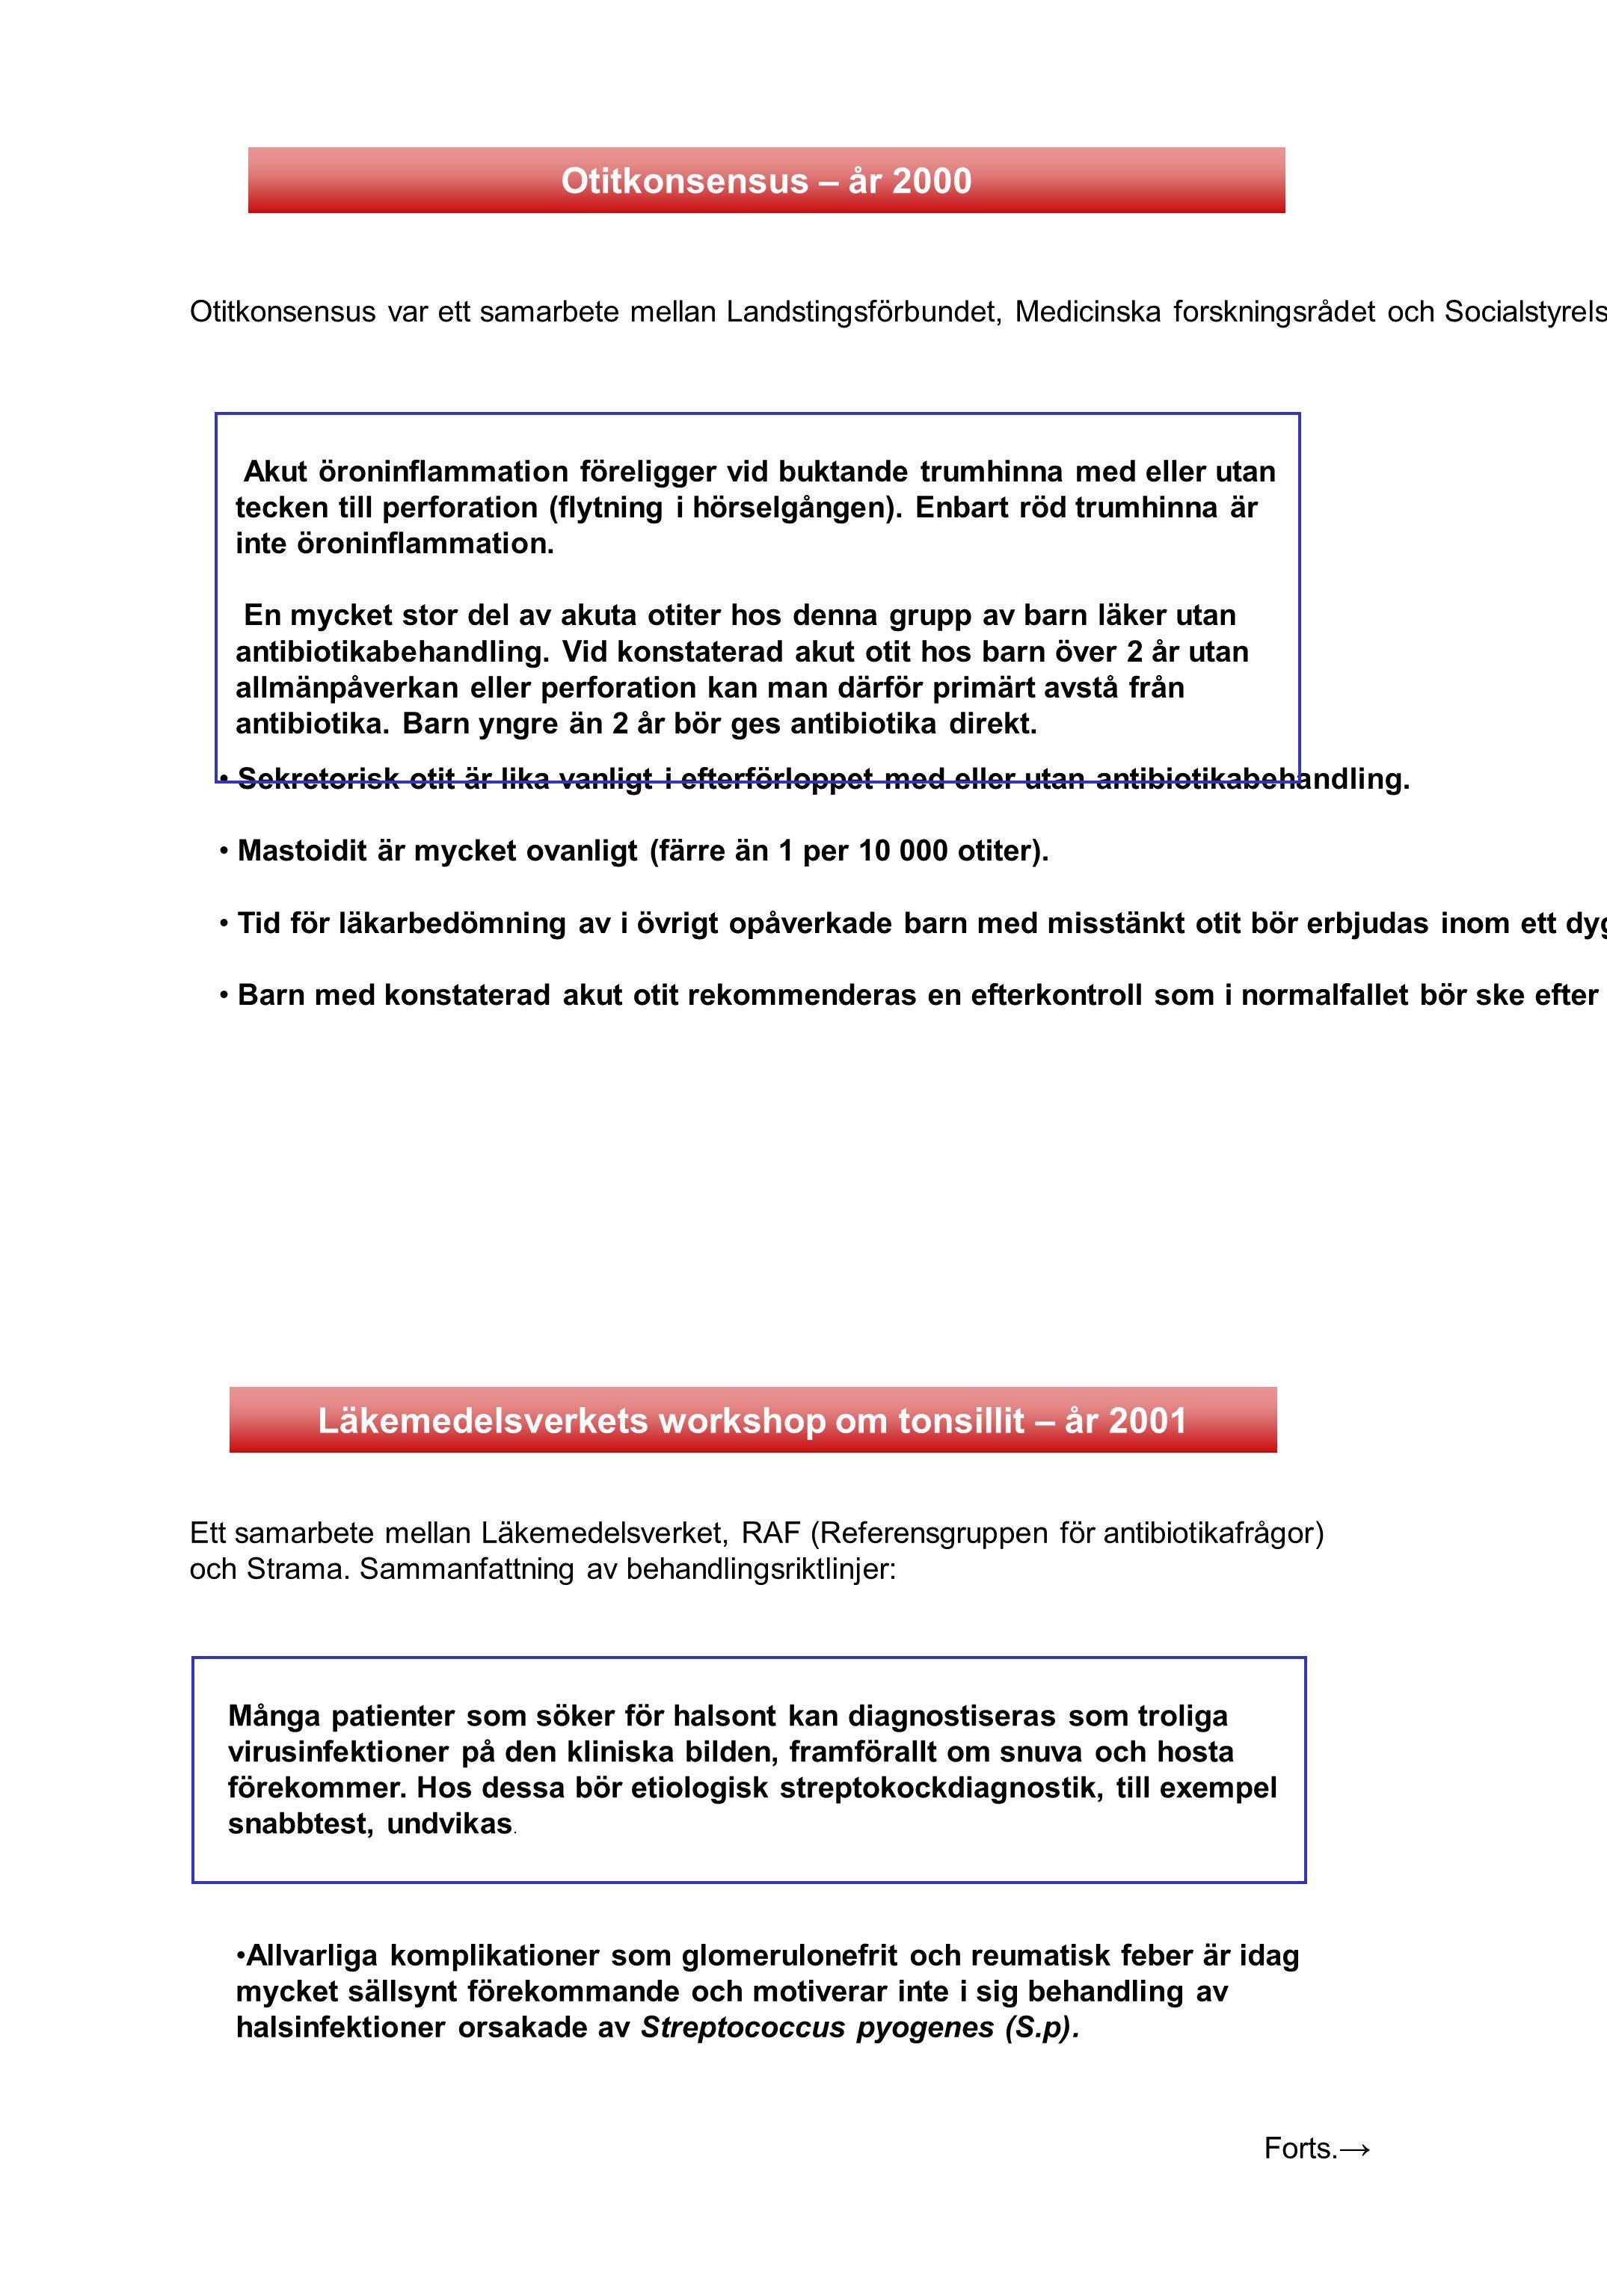 Läkemedelsverkets workshop om tonsillit – år 2001